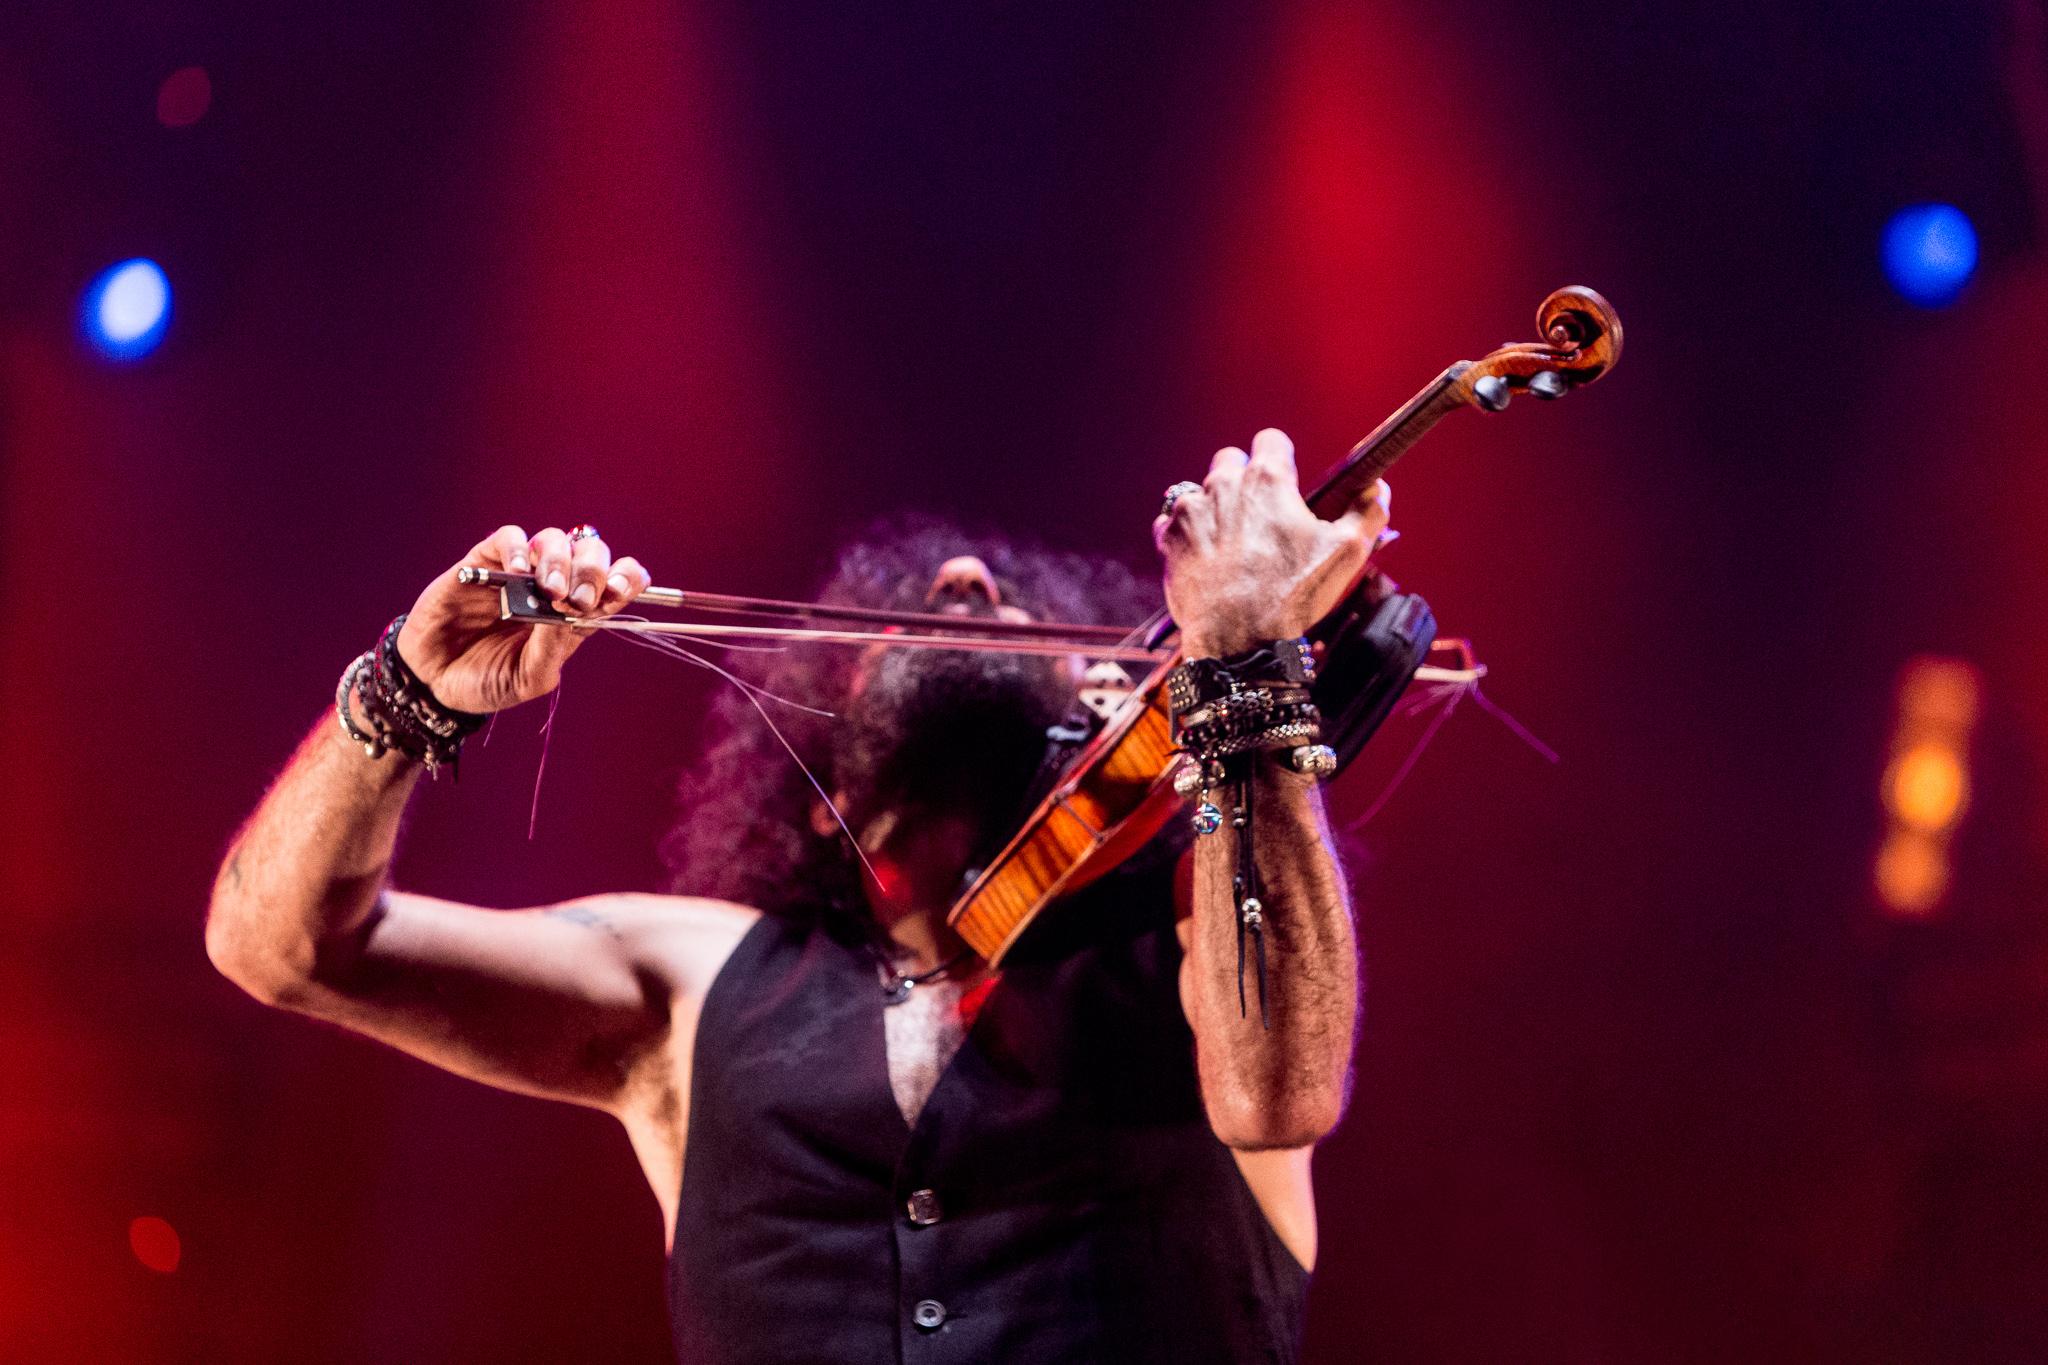 Ara Malikian - The Incredible World Tour of Violin - 2018